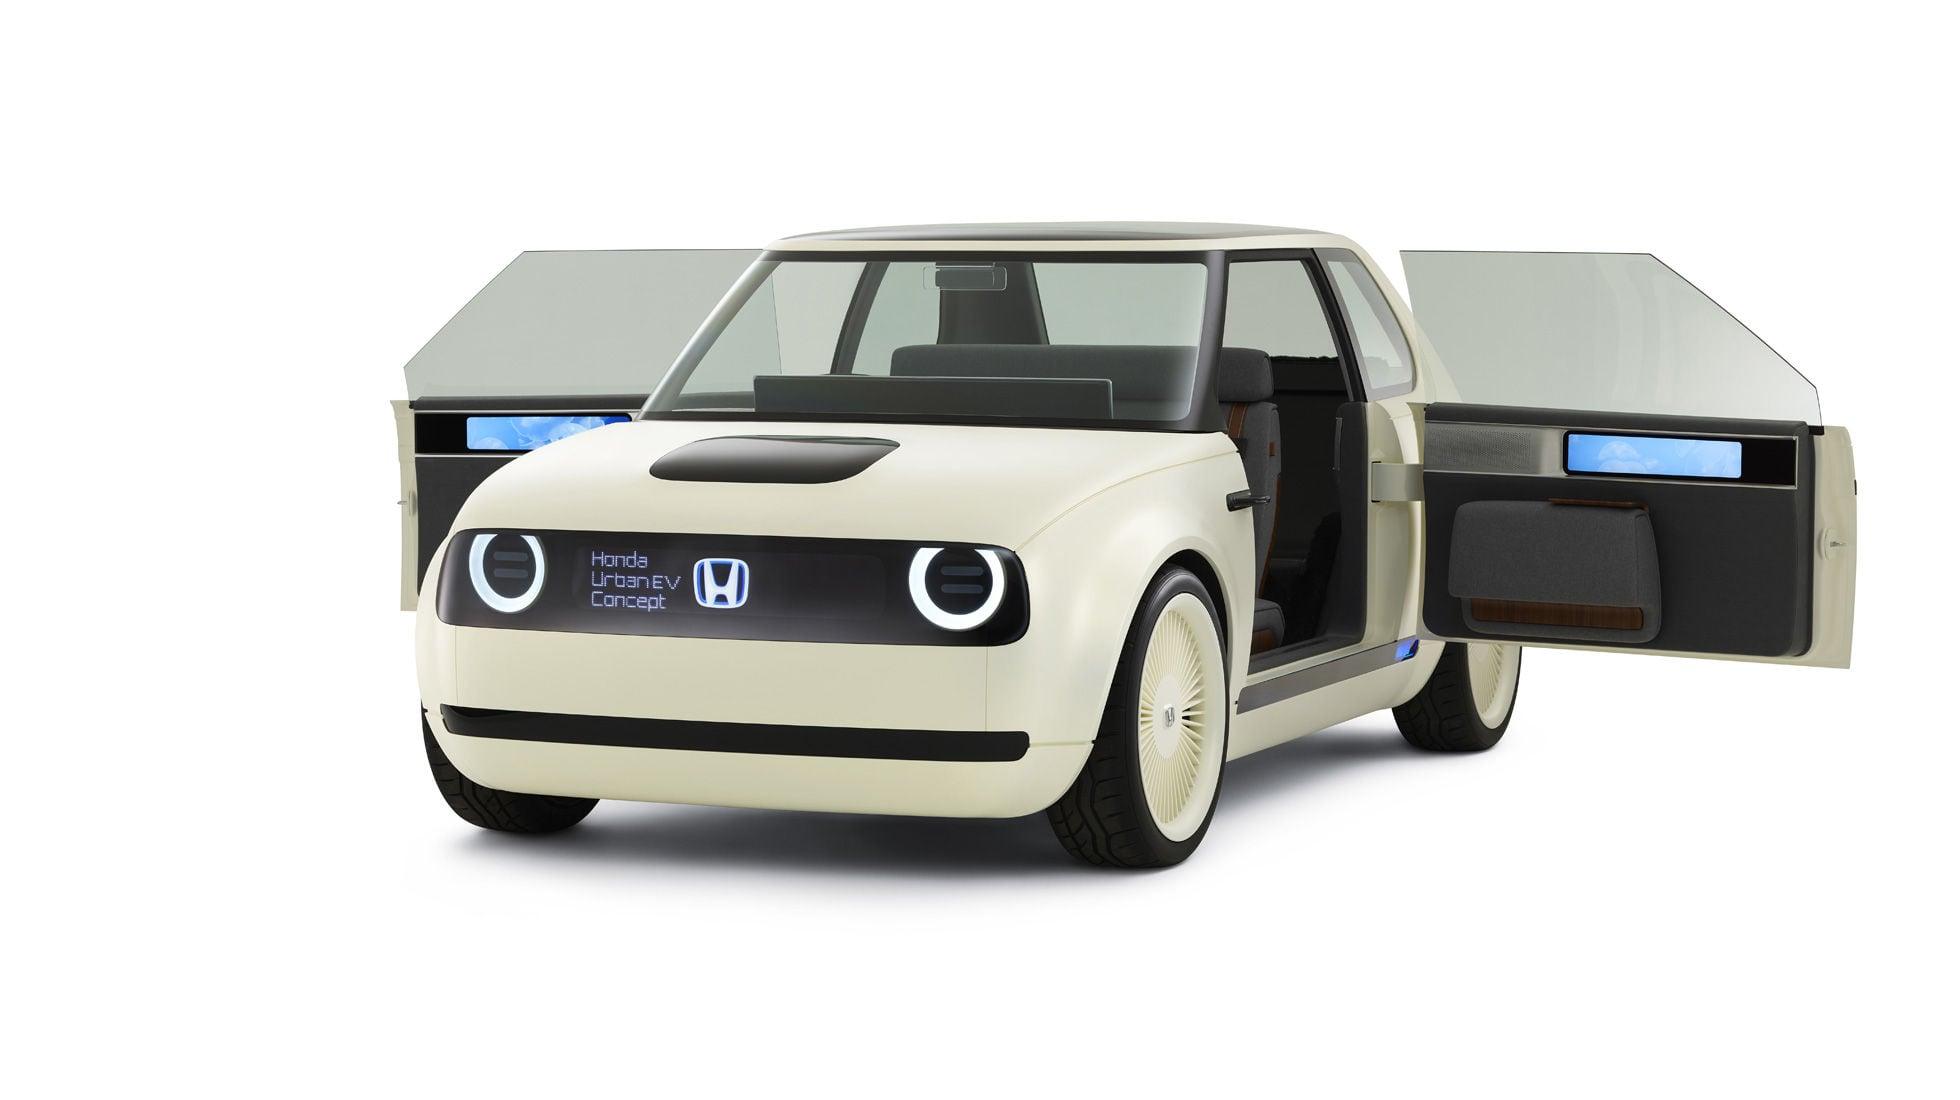 Honda Urban EV Concept with suicide doors